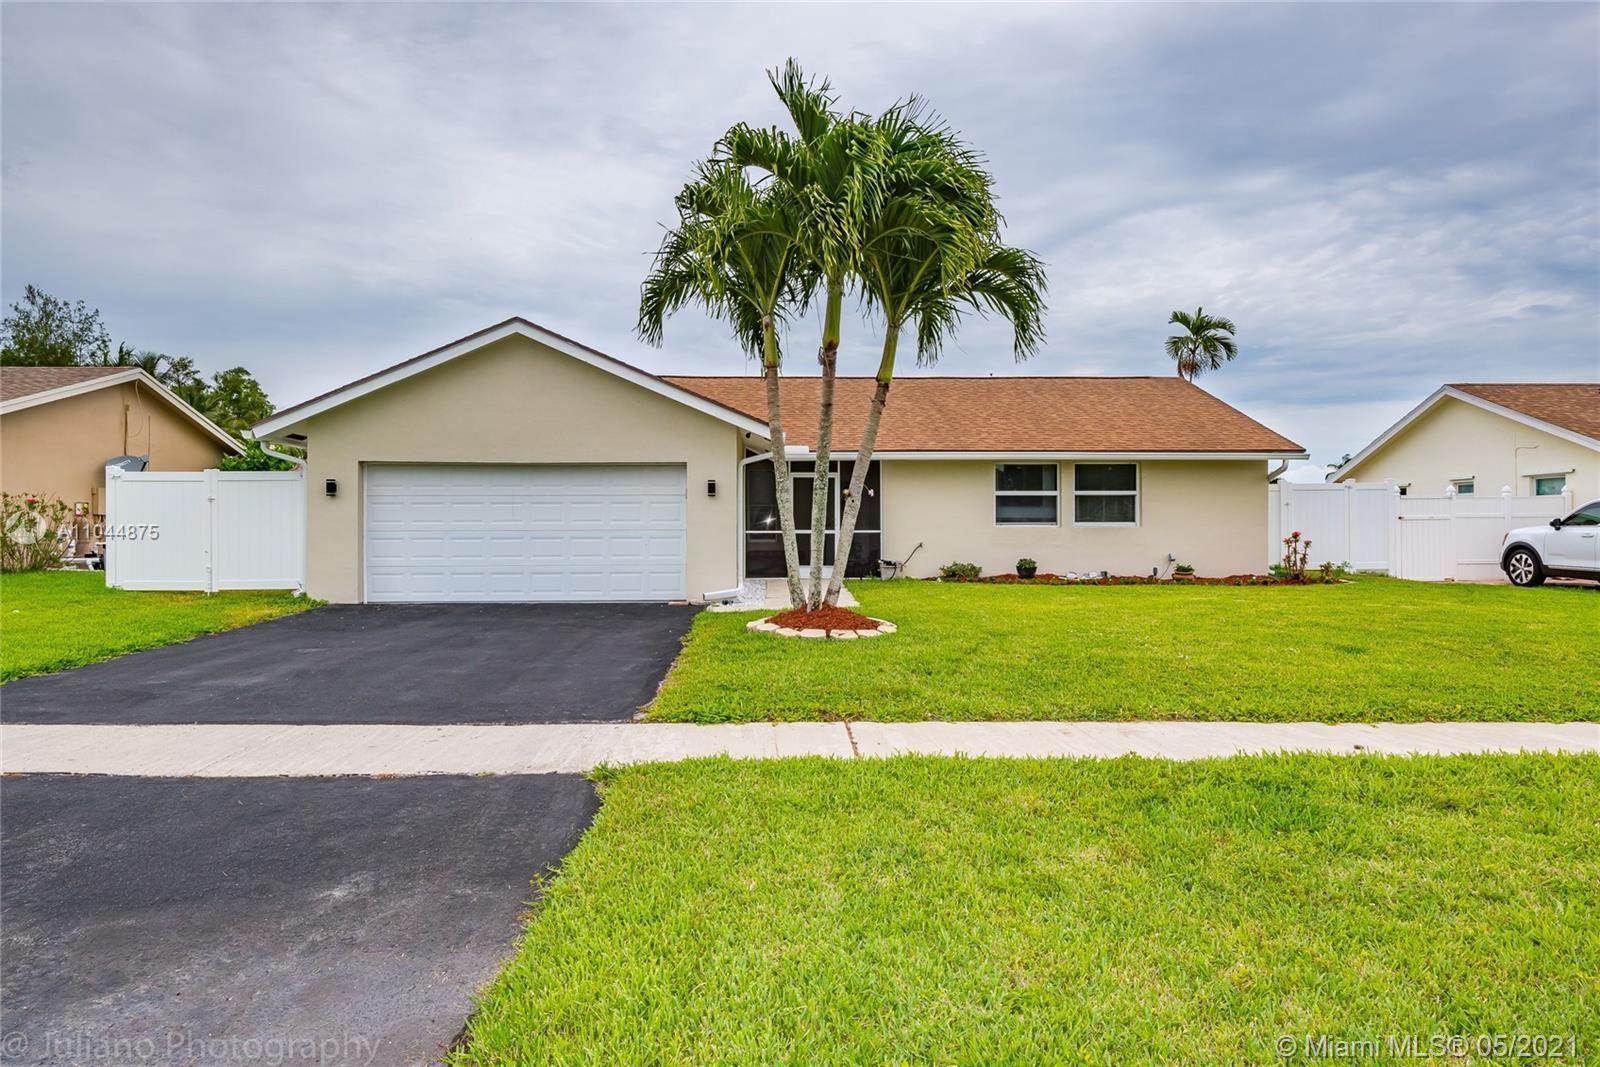 19342 Liberty Rd, Boca Raton, FL 33434 - #: A11044875